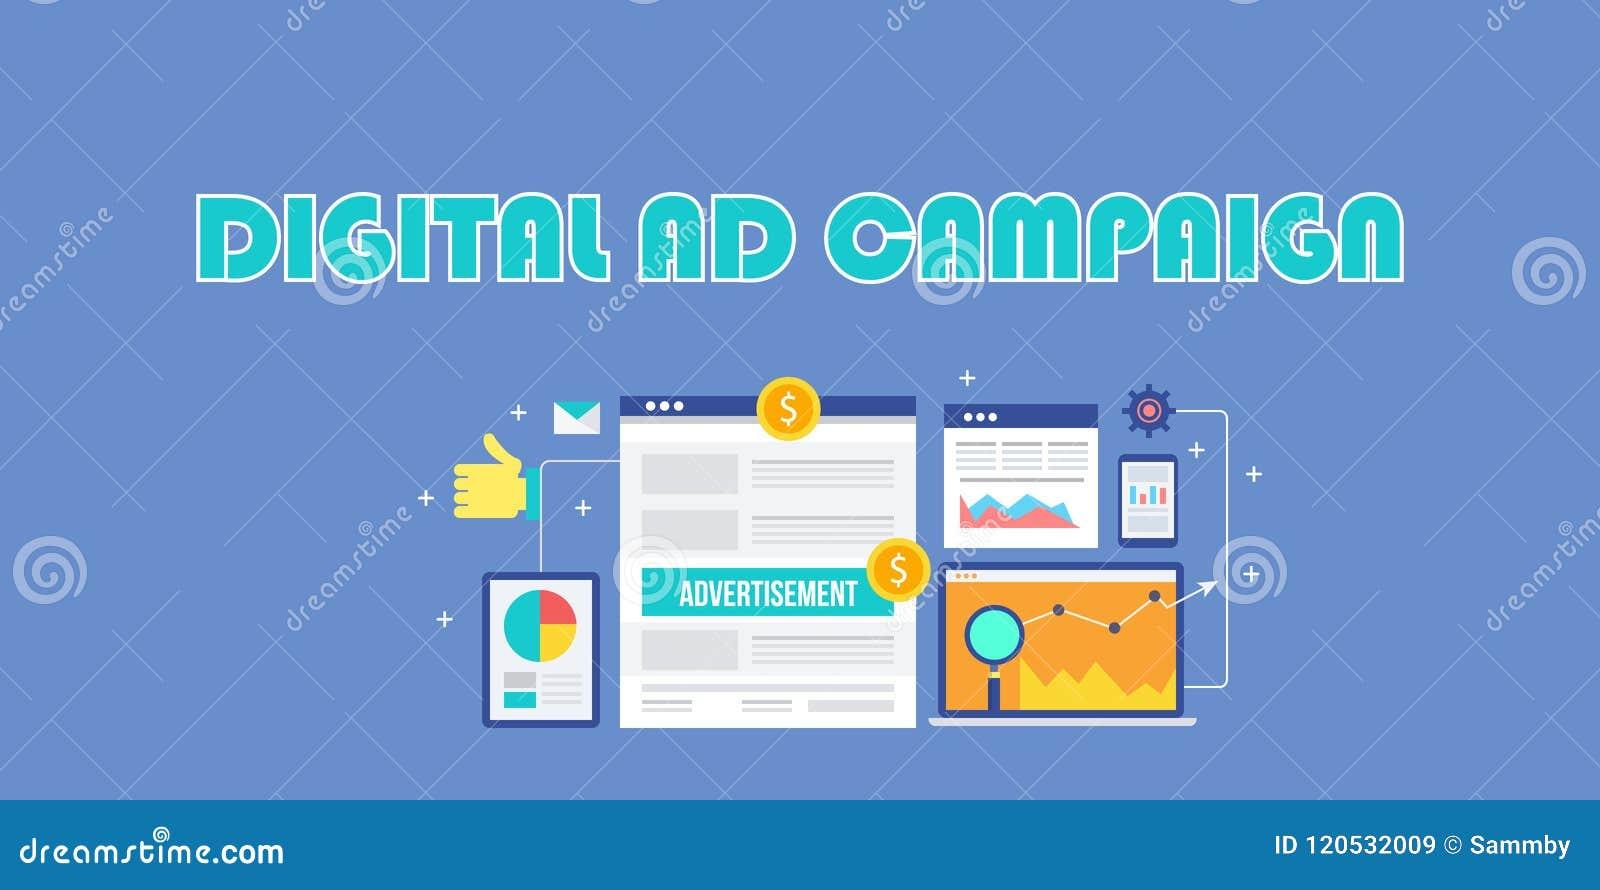 Campanha de publicidade de Digitas, propaganda do Internet, anúncios sociais dos meios, mercado móvel, conceito da propaganda da